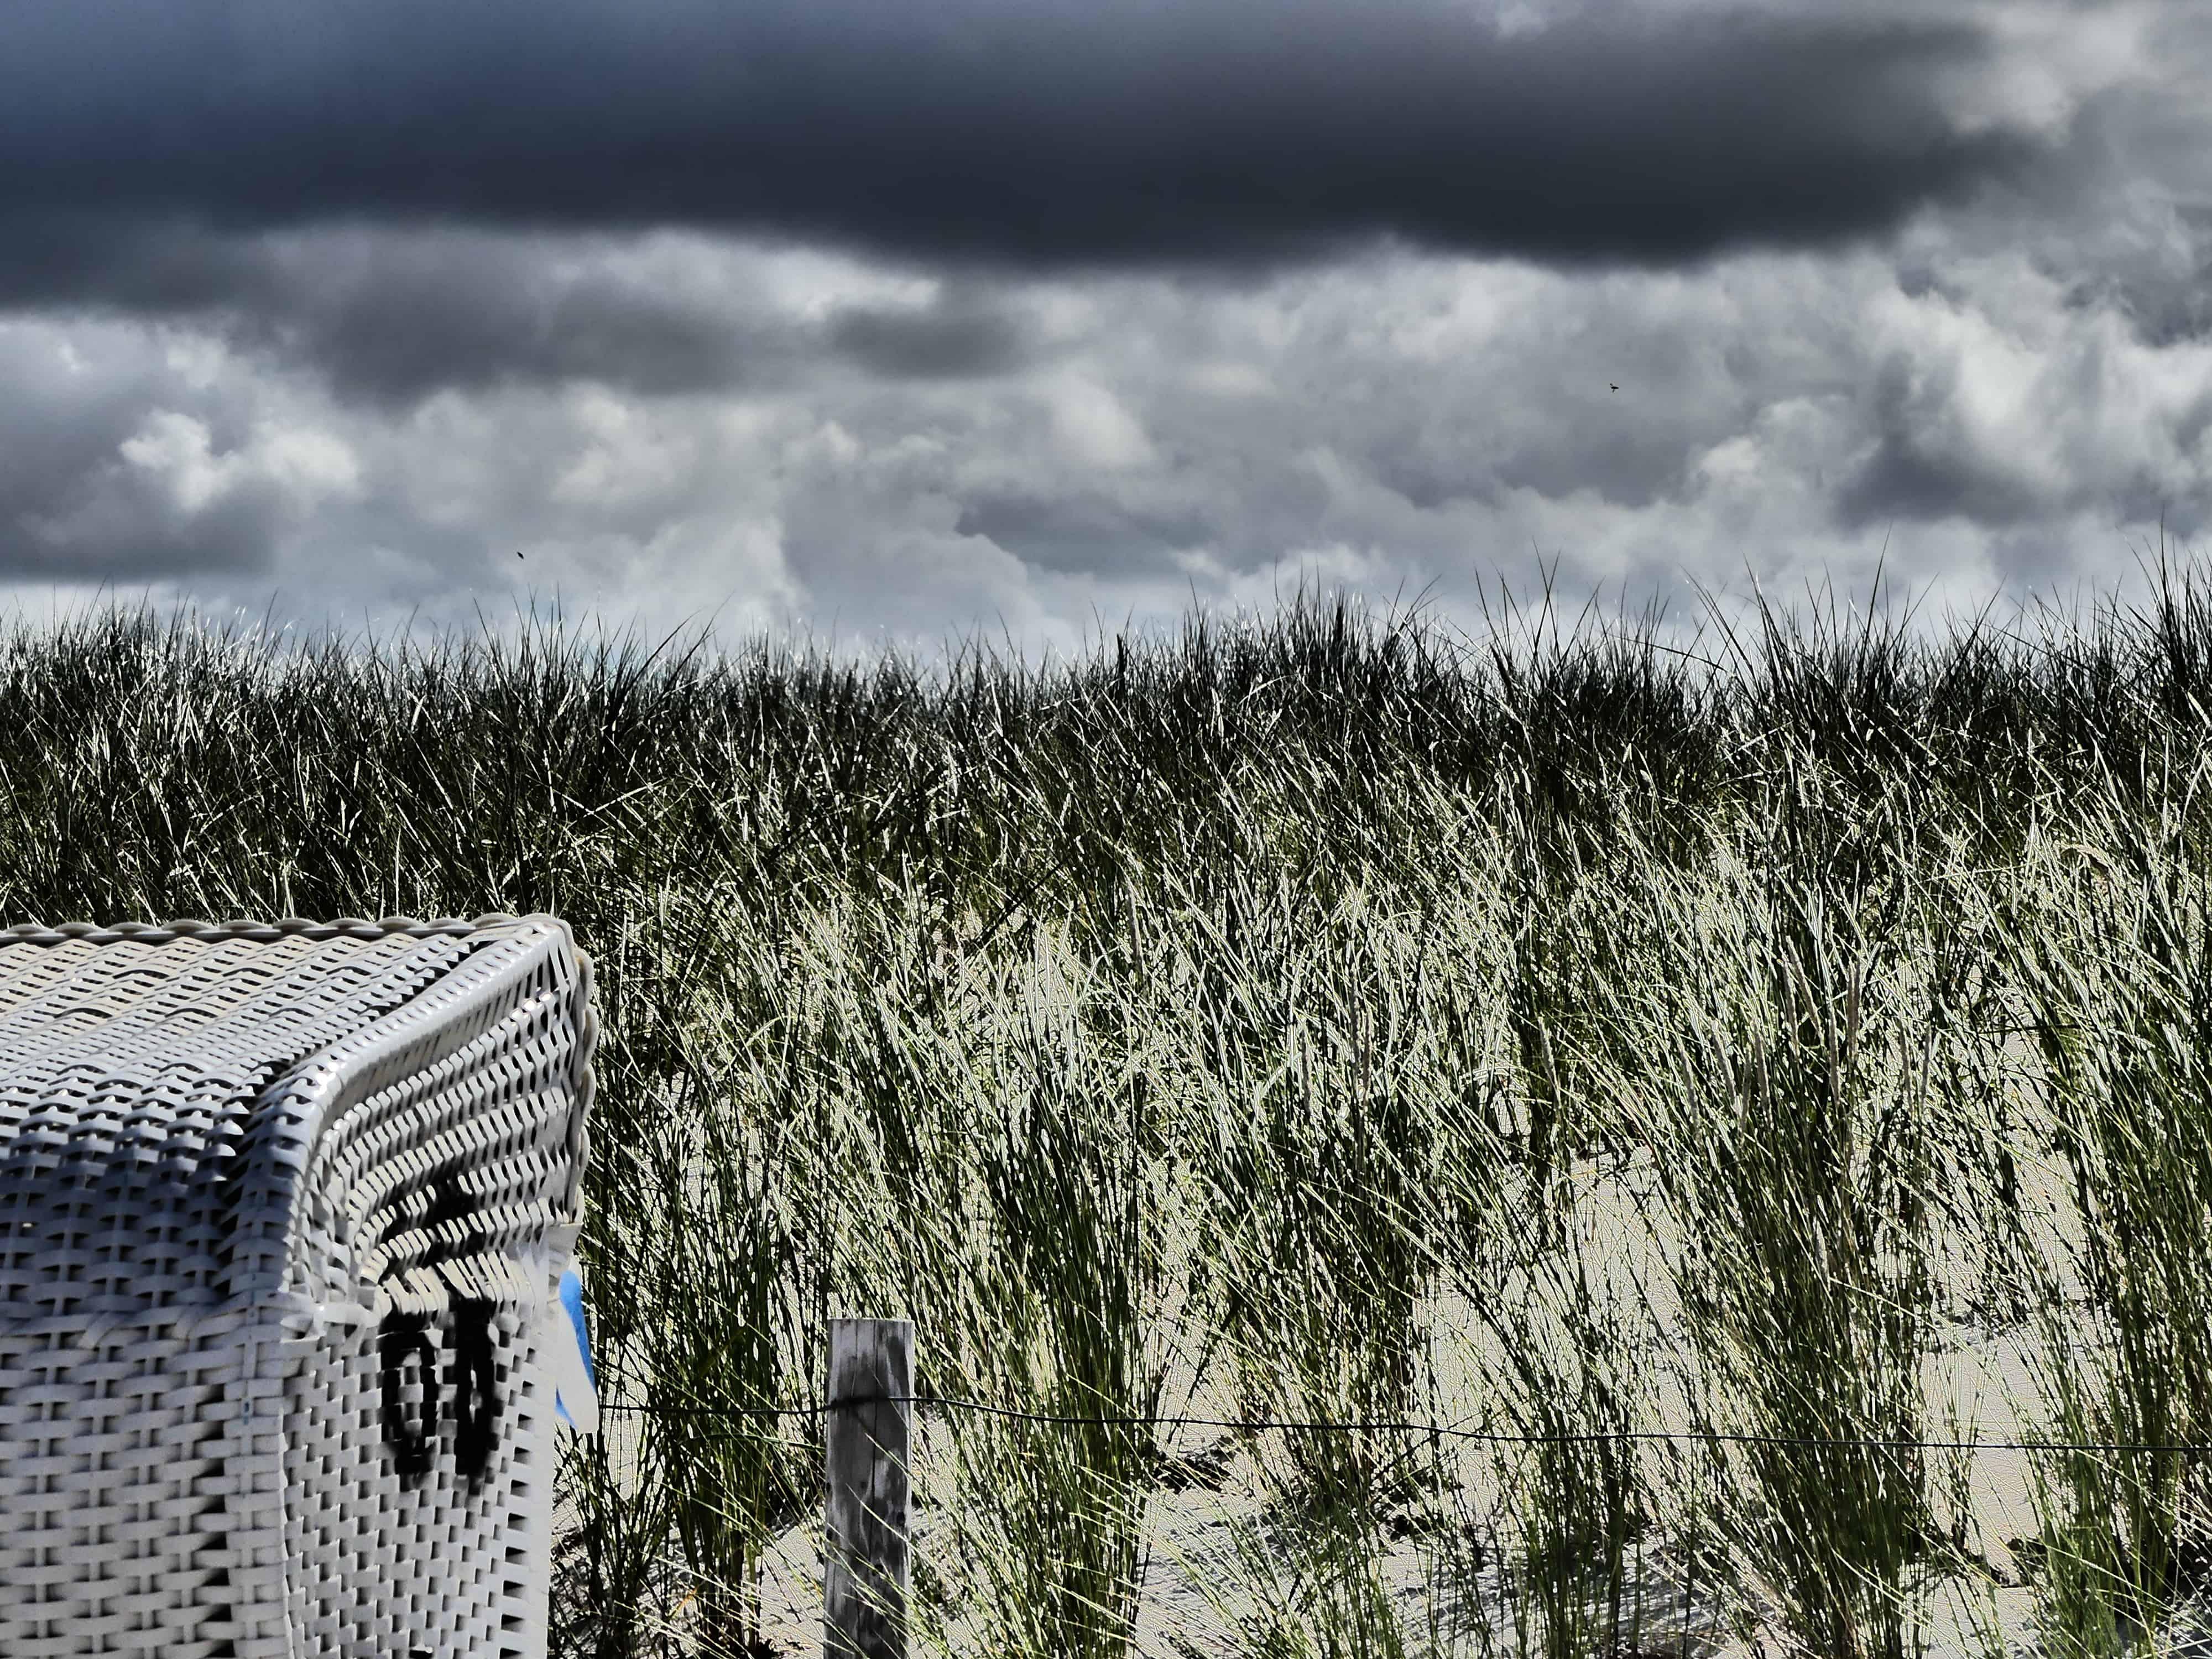 Ostseebad Rerik Bilder - Strandkorb und Düne